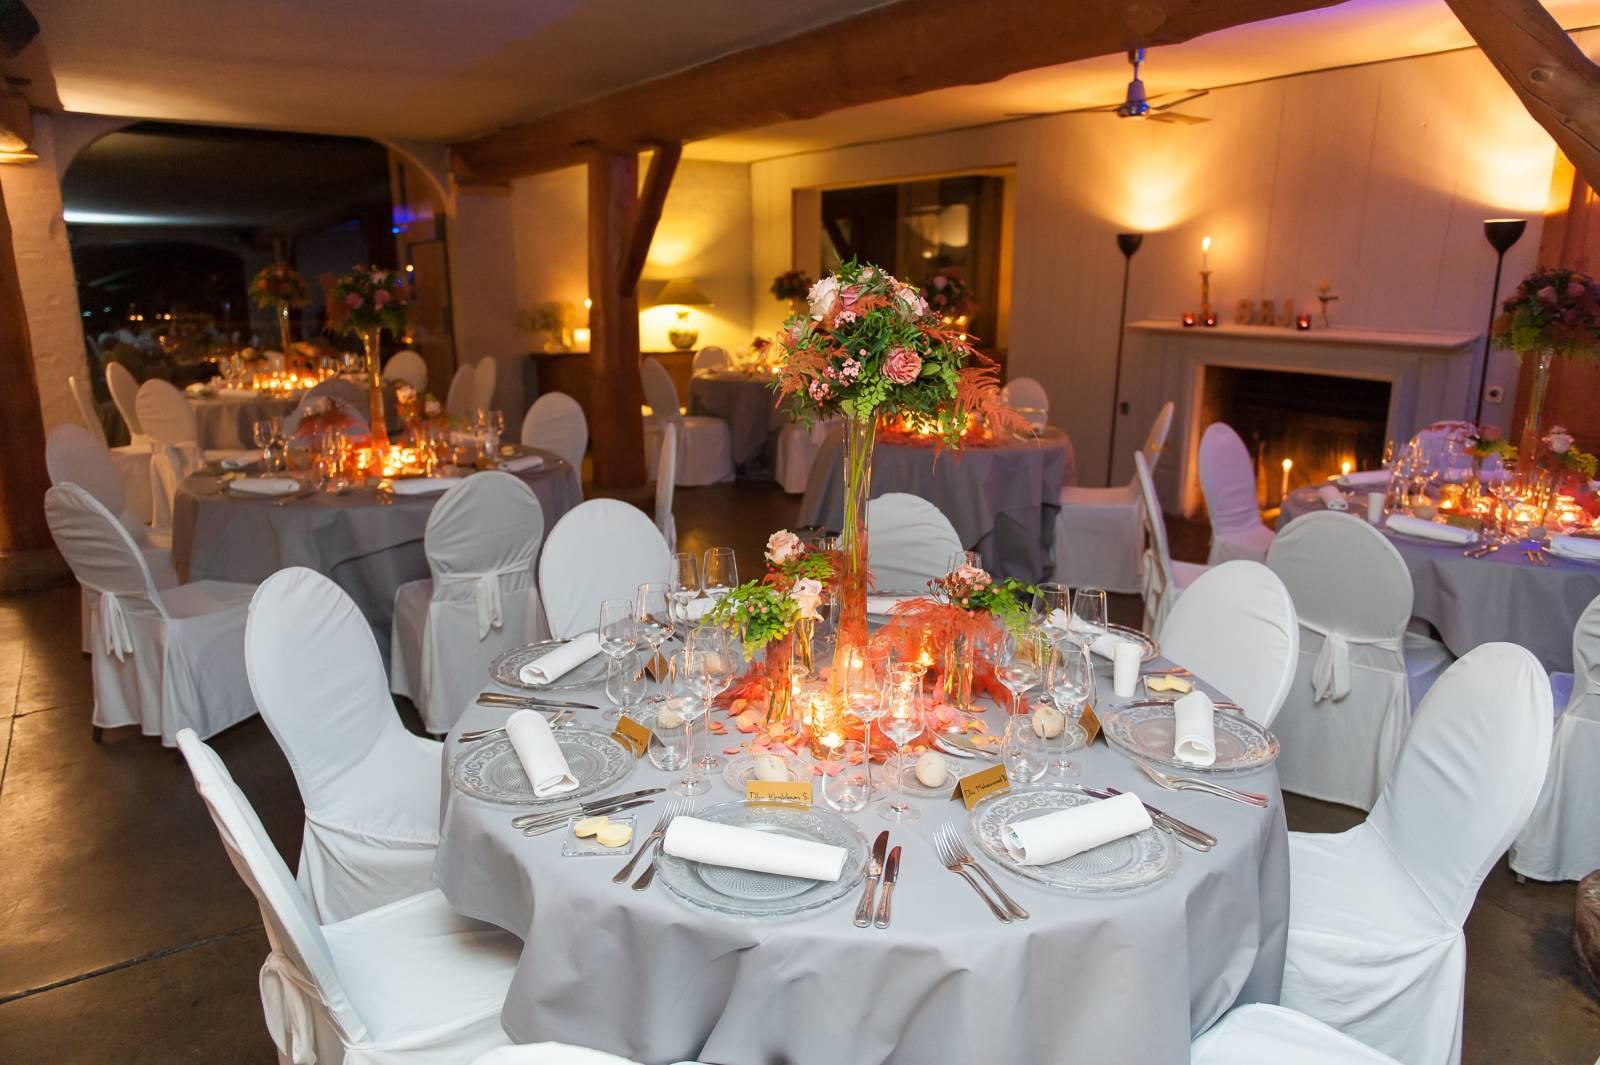 Flinckheuvel - House of Weddings-06